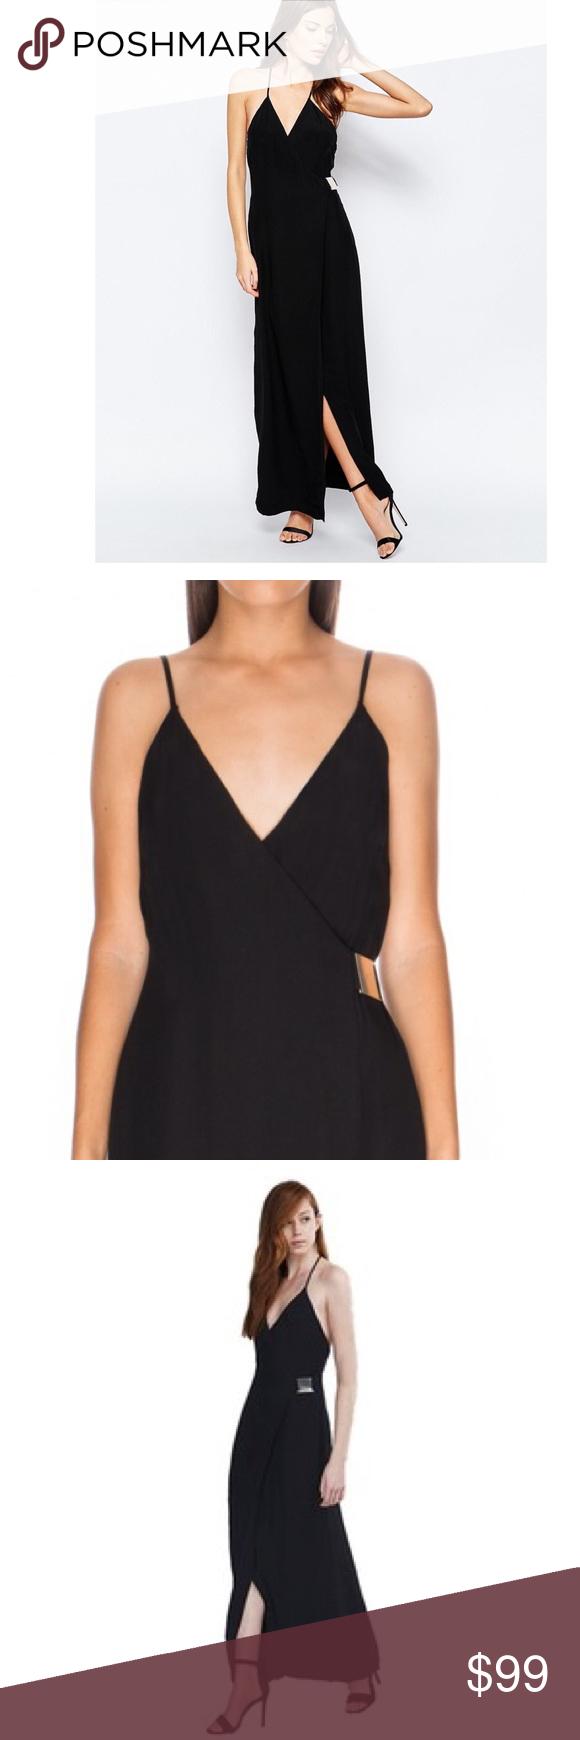 Keepsake Oasis Maxi Spaghetti Straps Dress Nwt Spaghetti Strap Dresses Fashion Clothes Design